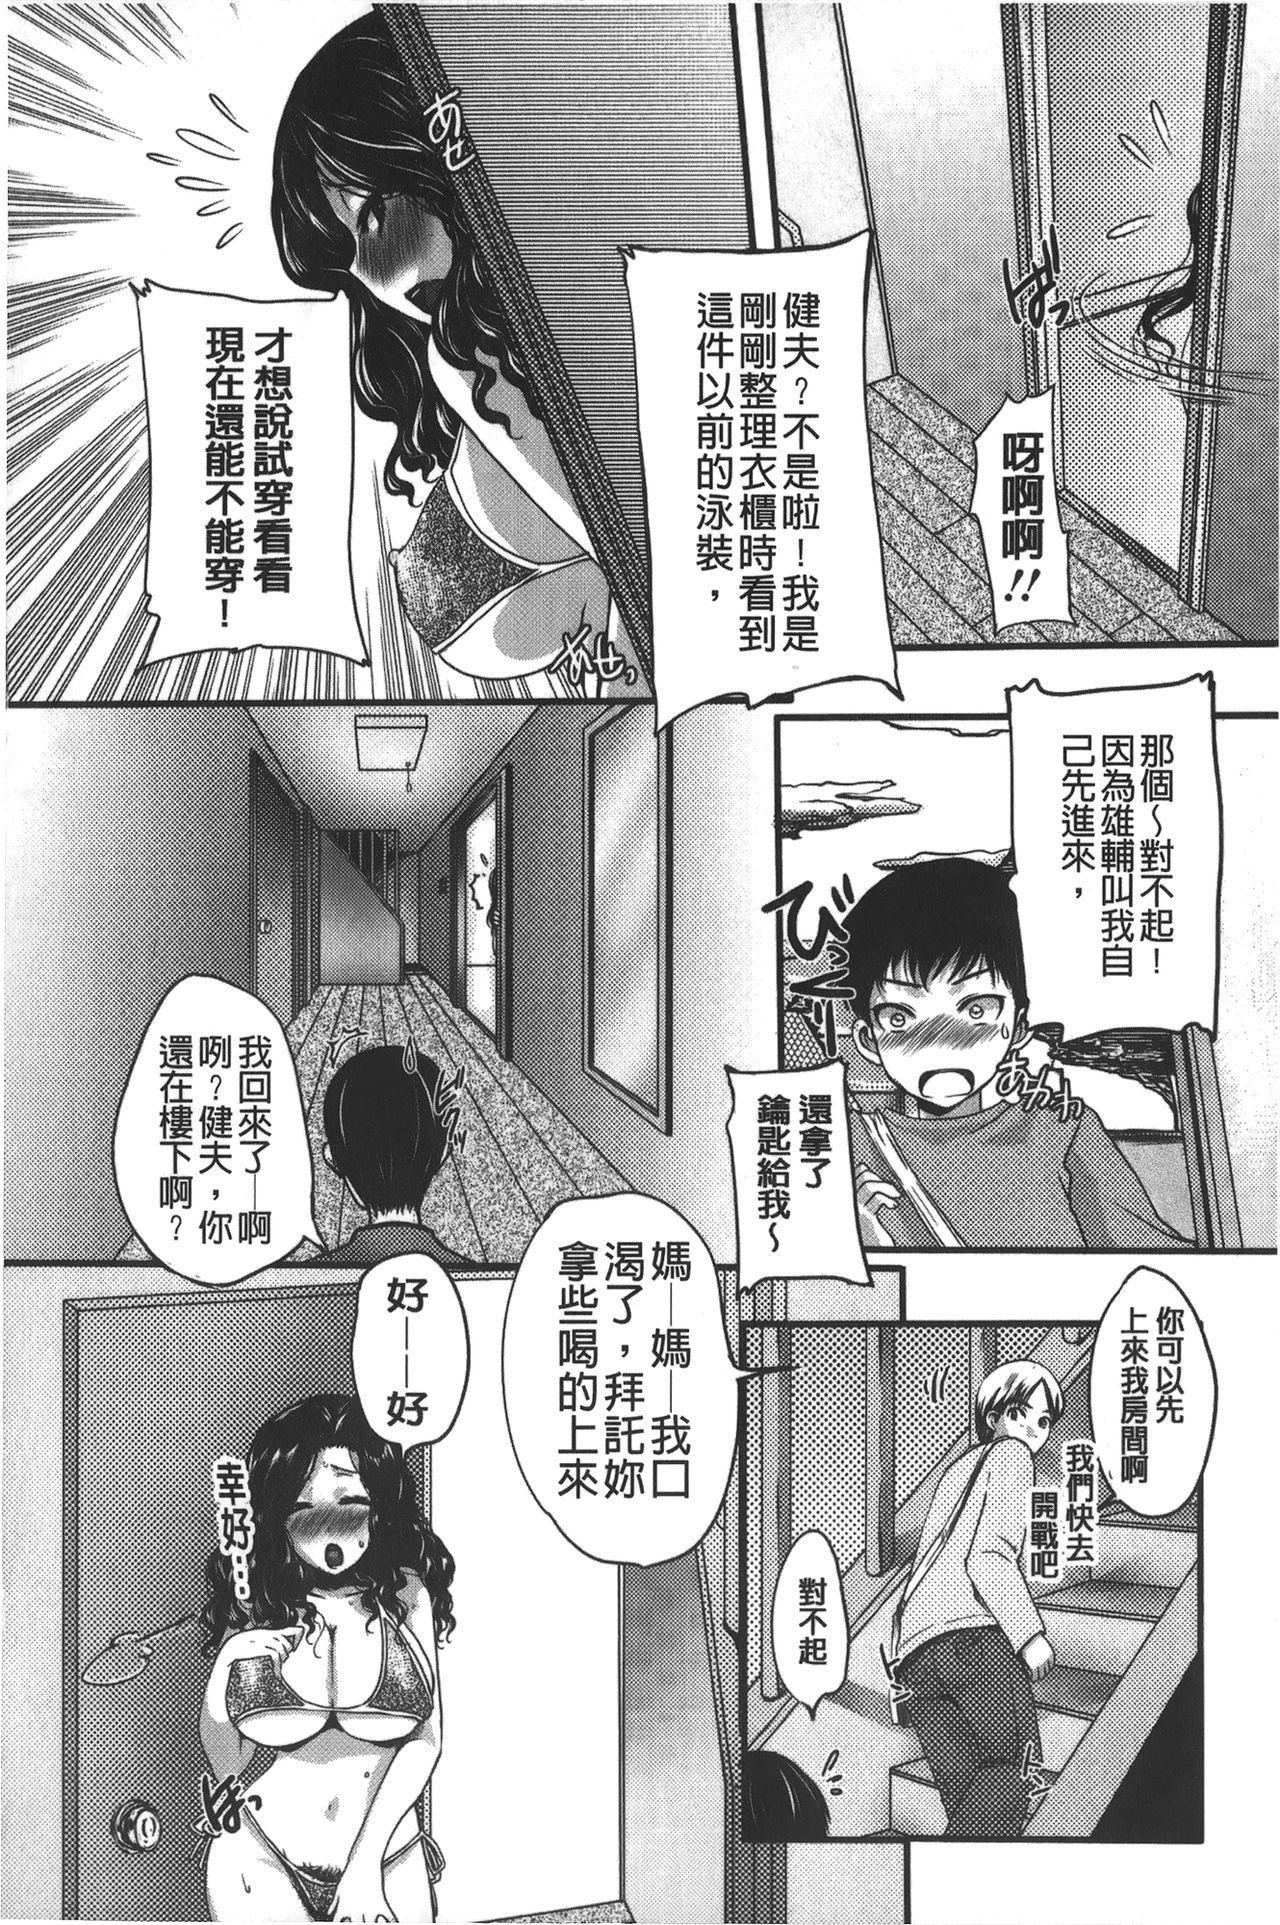 Kanjuku Torozuma 32